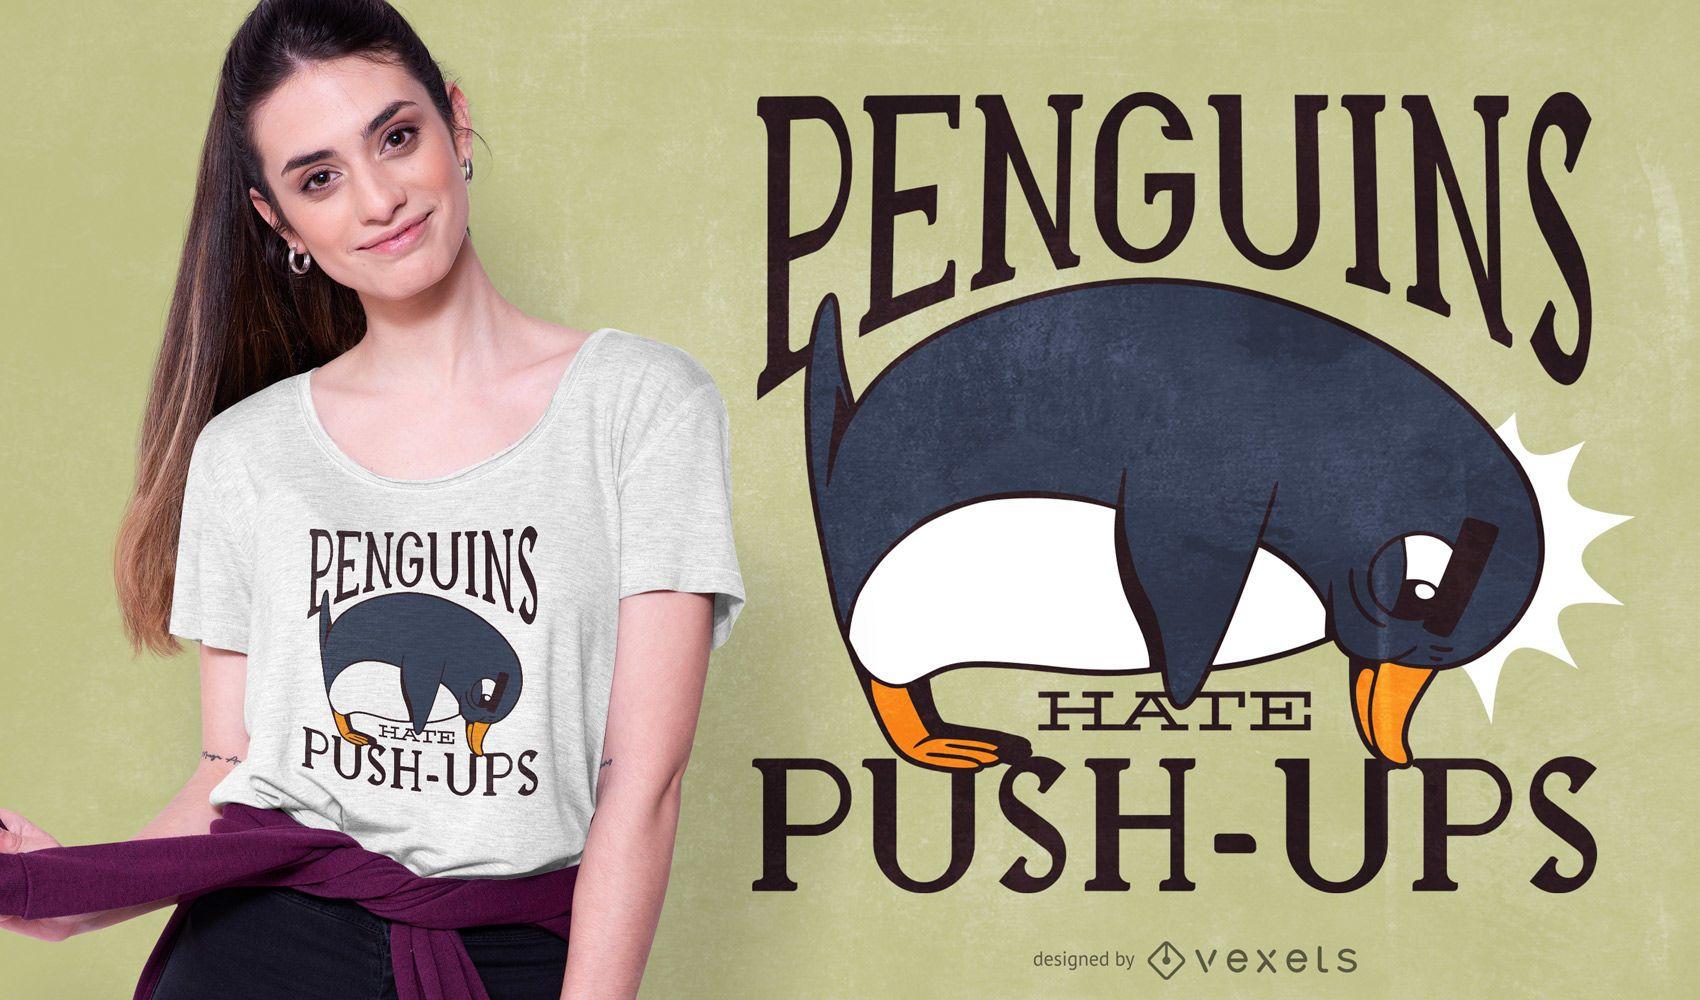 Diseño de camiseta de cita divertida de pingüino